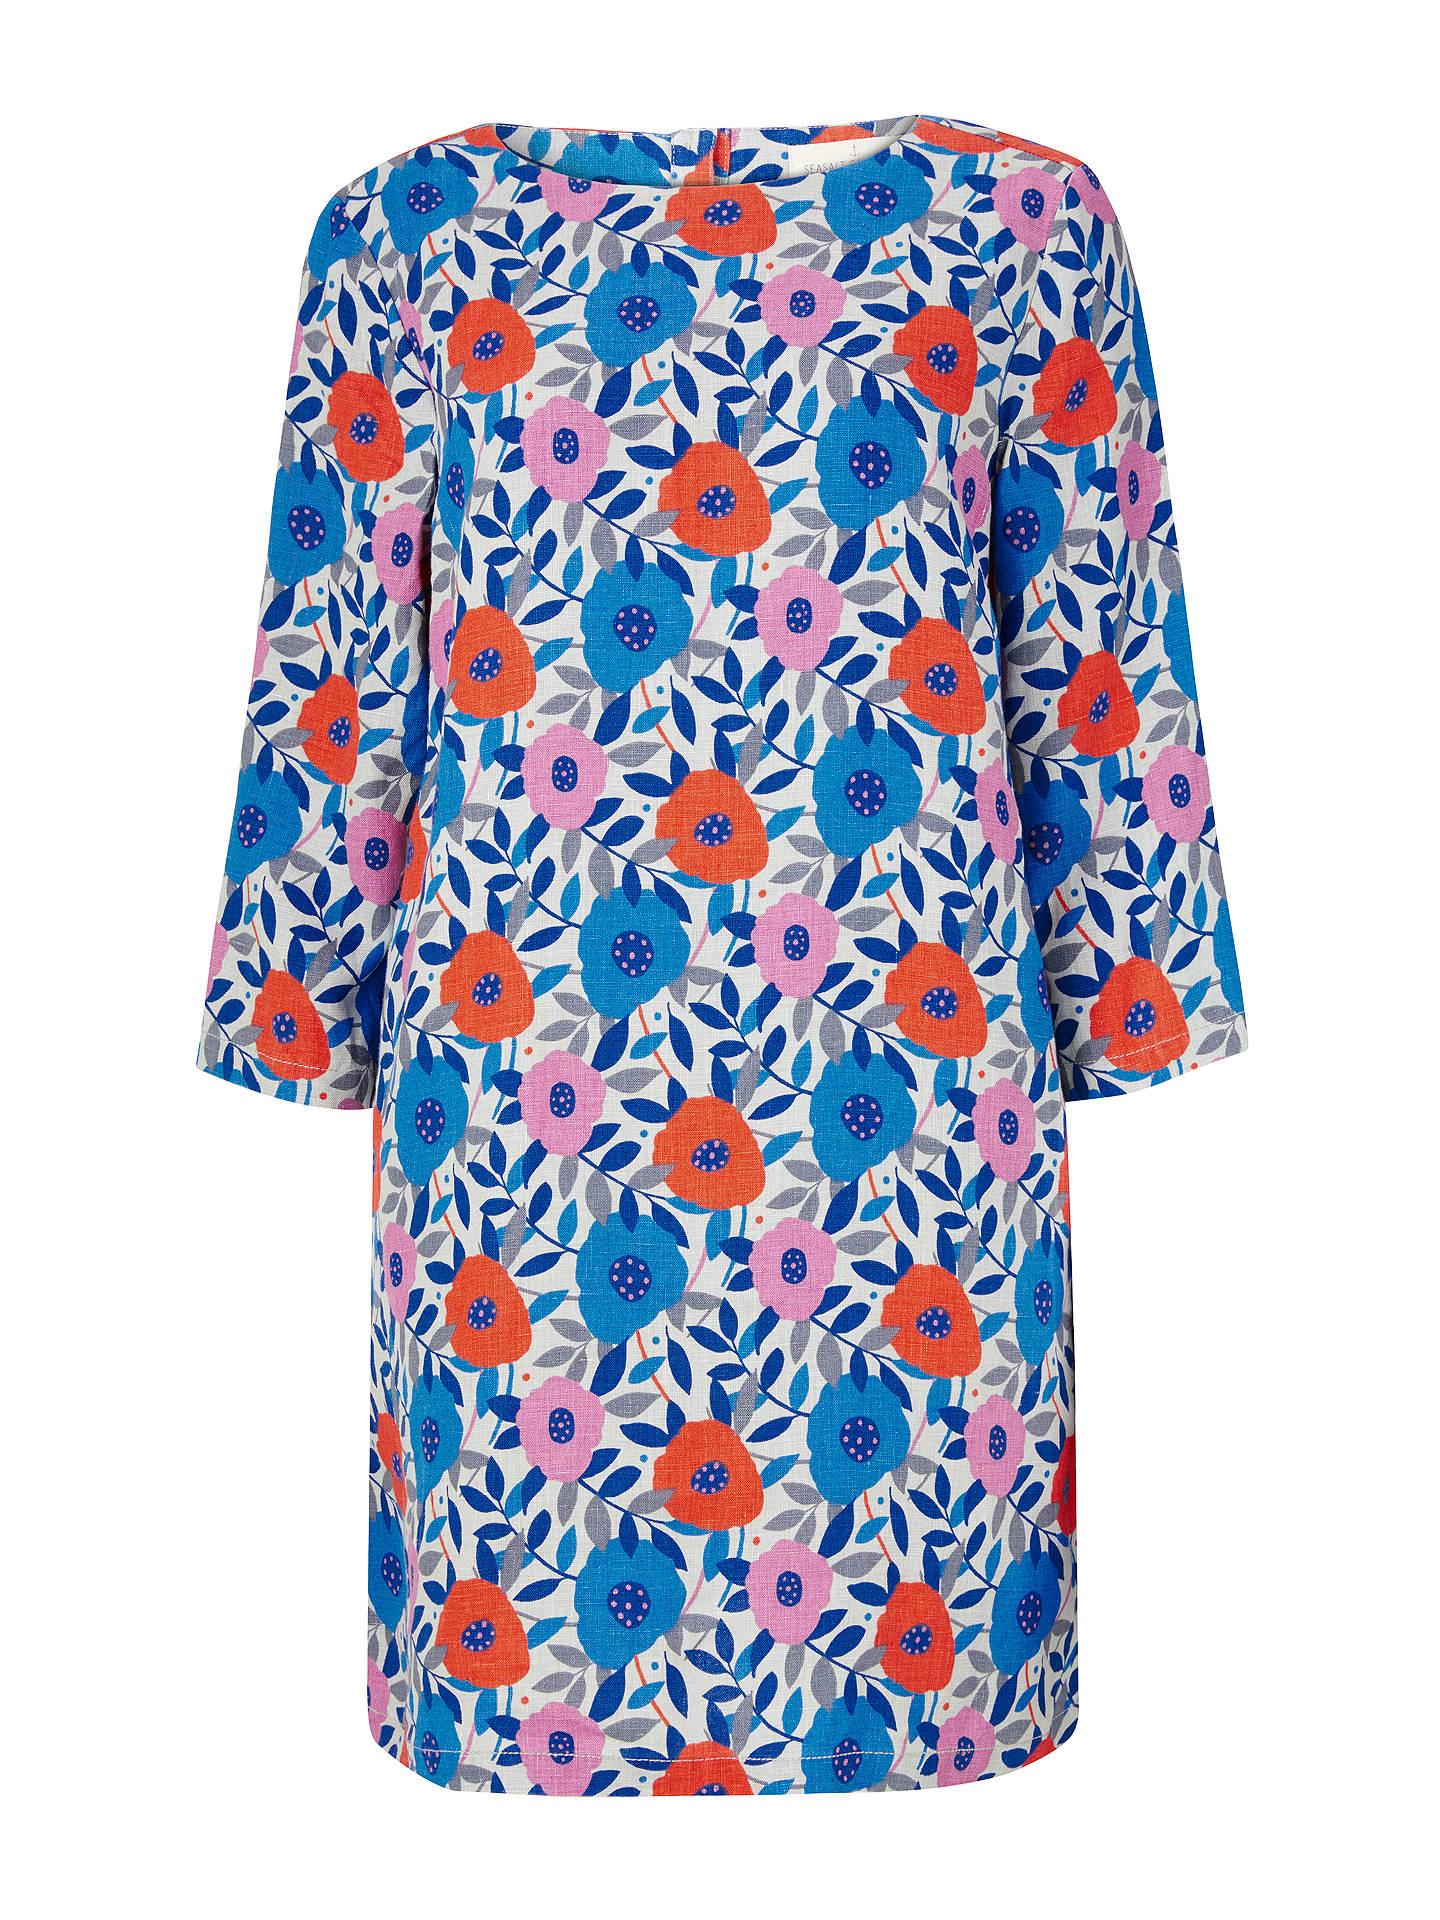 190ceb543e3 Buy Seasalt Sol Blaze Tunic Top, Flower Collage Cobble, 8 Online at  johnlewis.